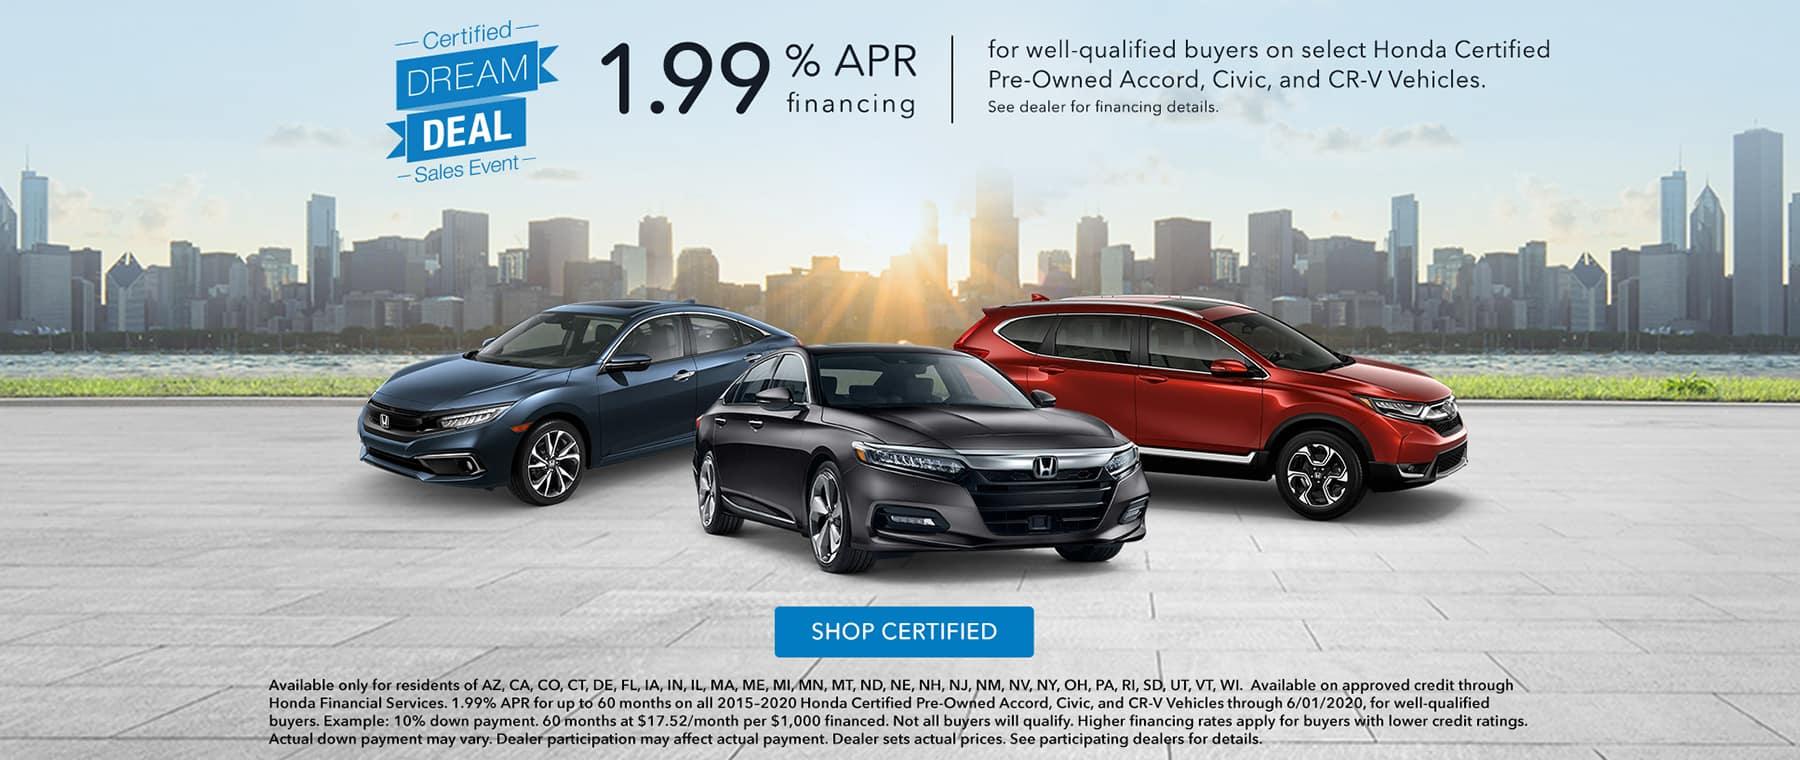 Finance for 1.99% APR on Honda CPO